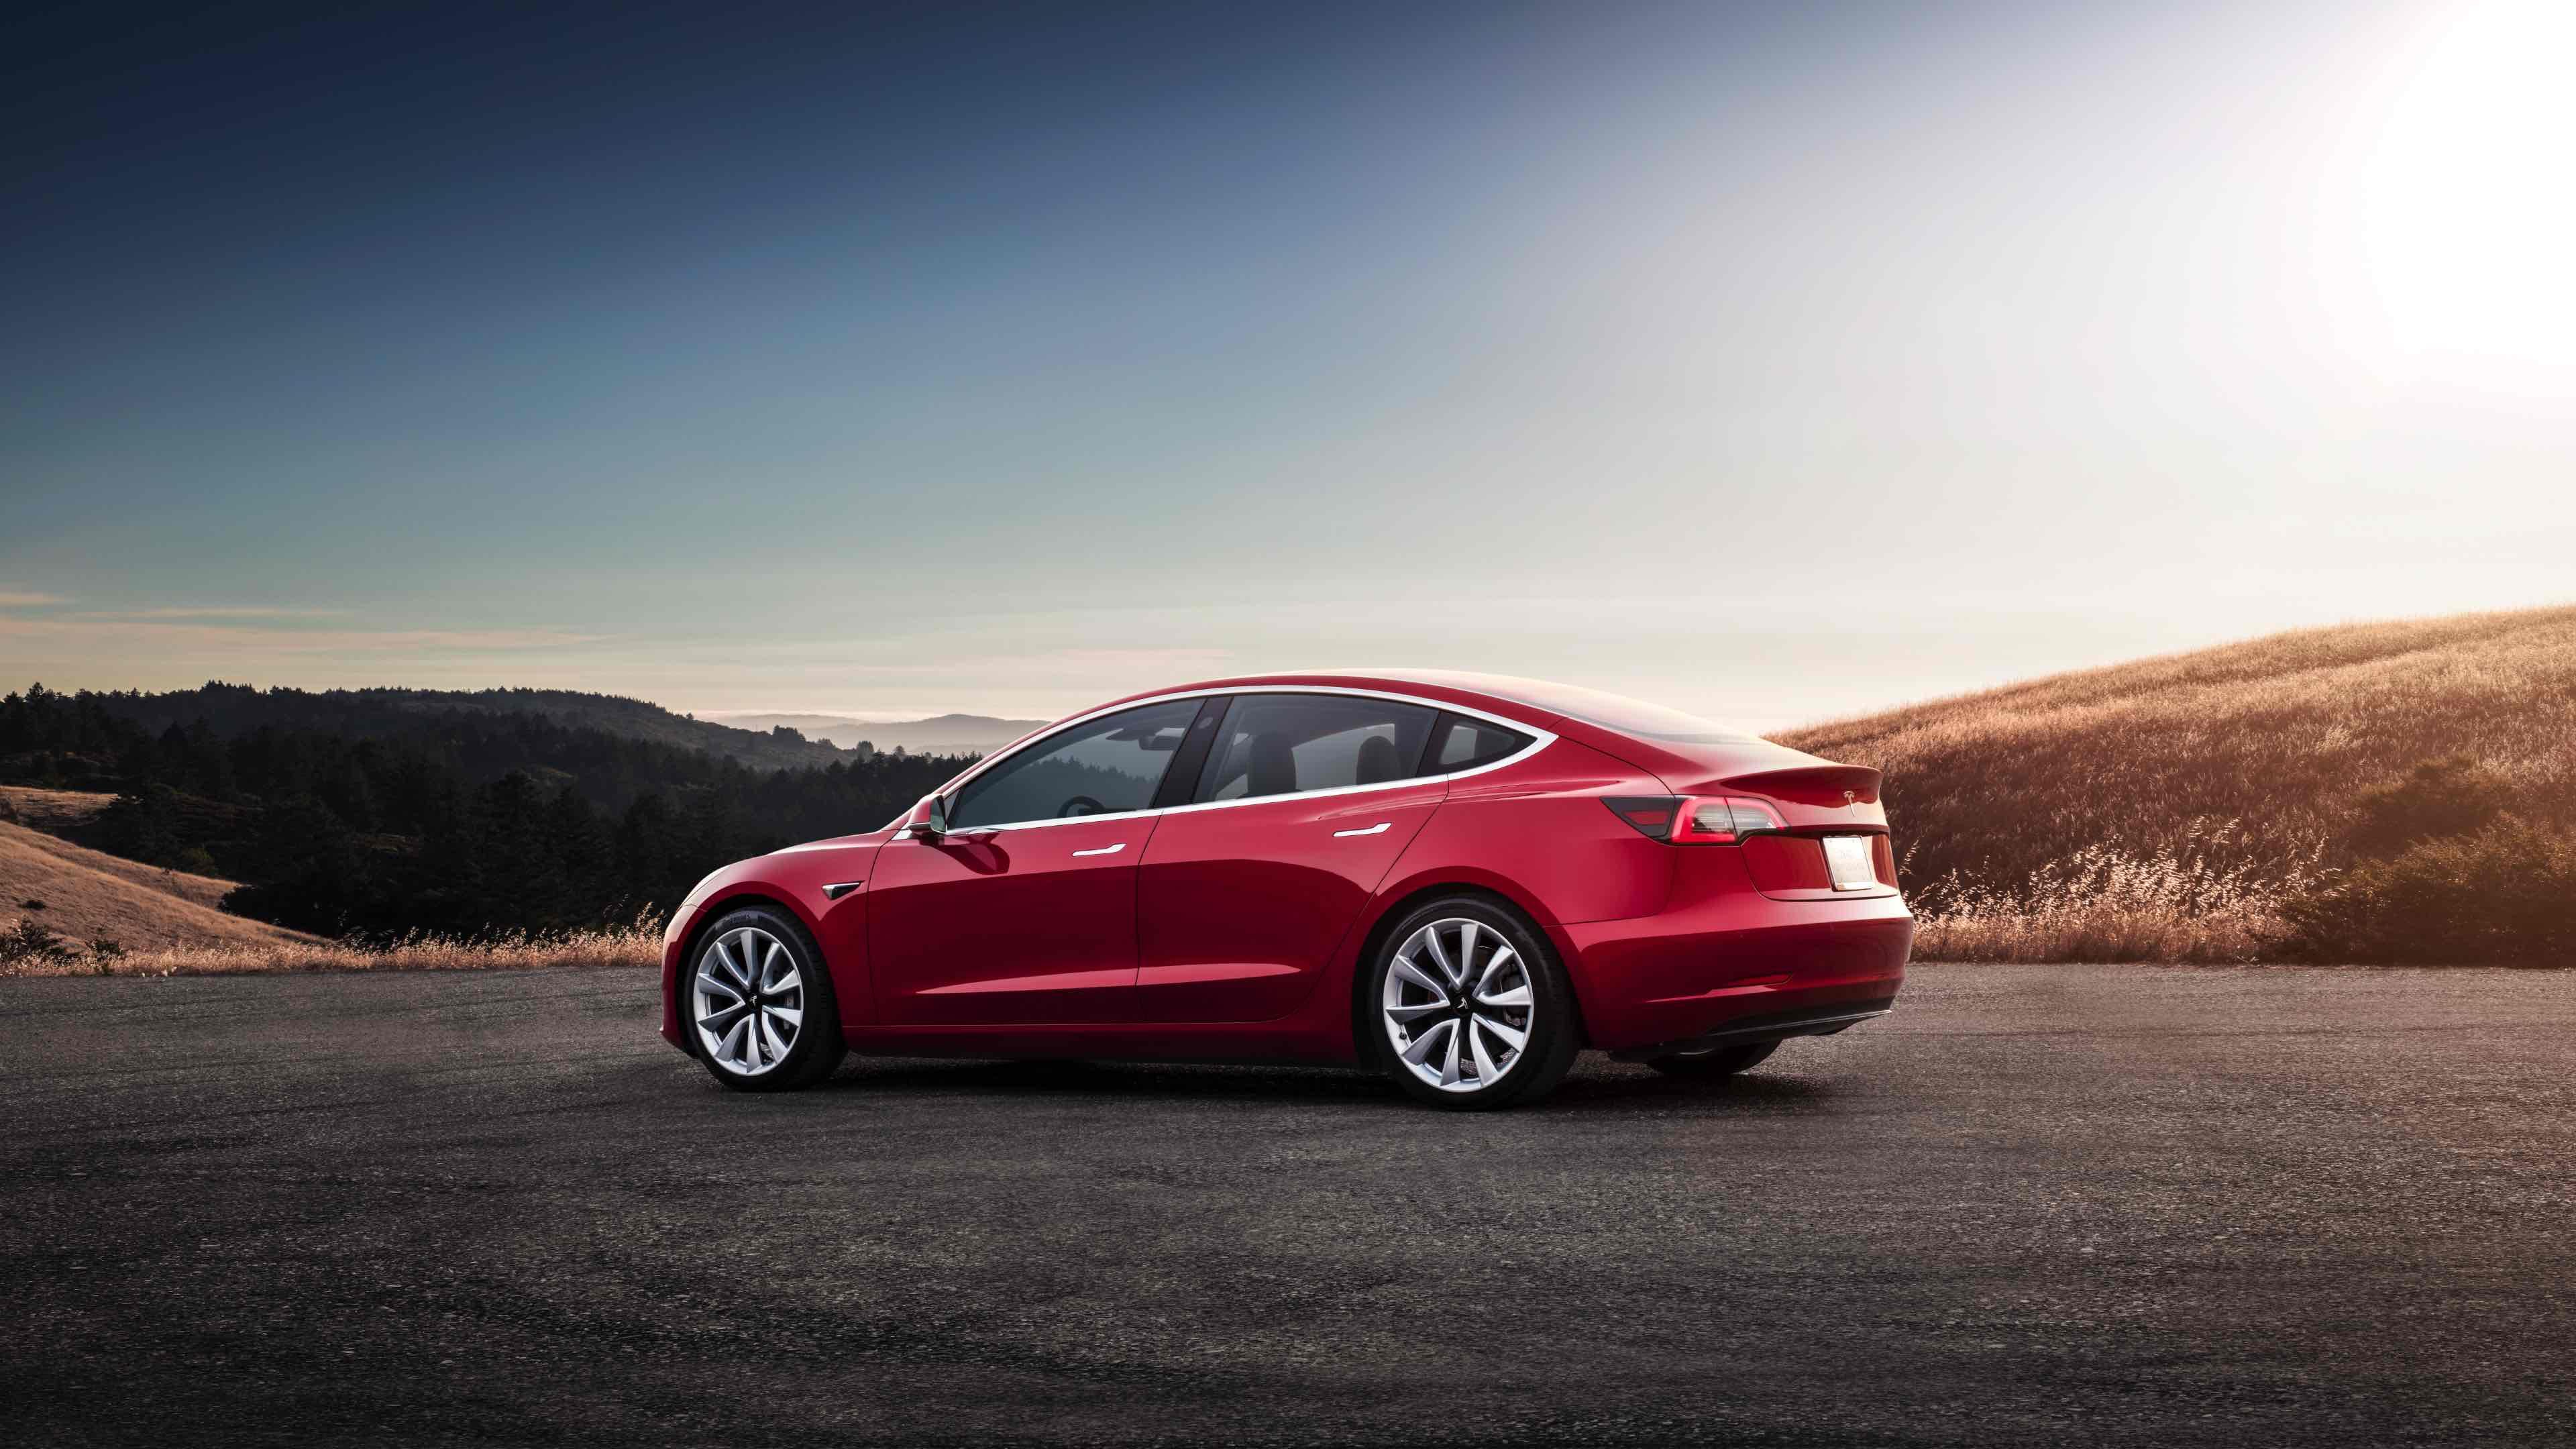 Tesla Model 3 - Red Rear Sunset